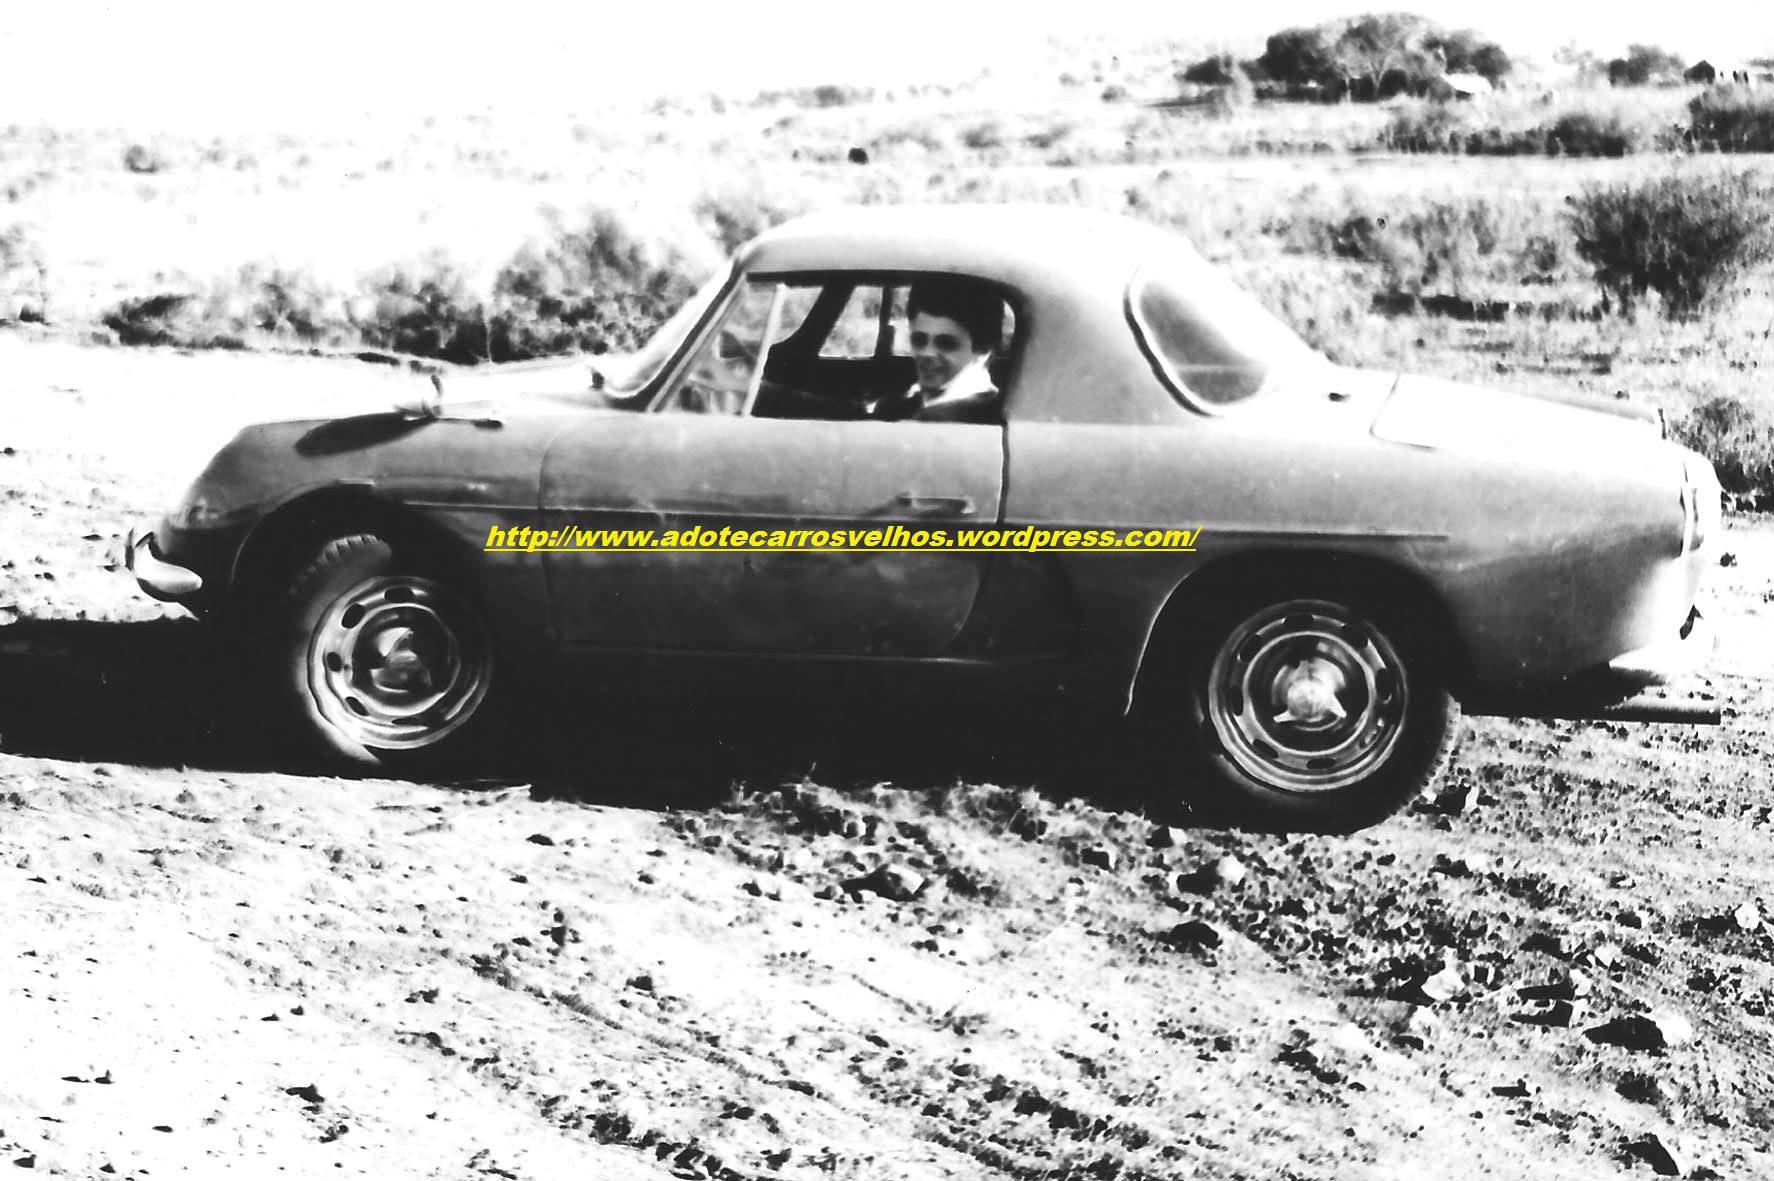 Willys-Interlagos-1966 Willys Interlagos 1966, em Alegrete-RS